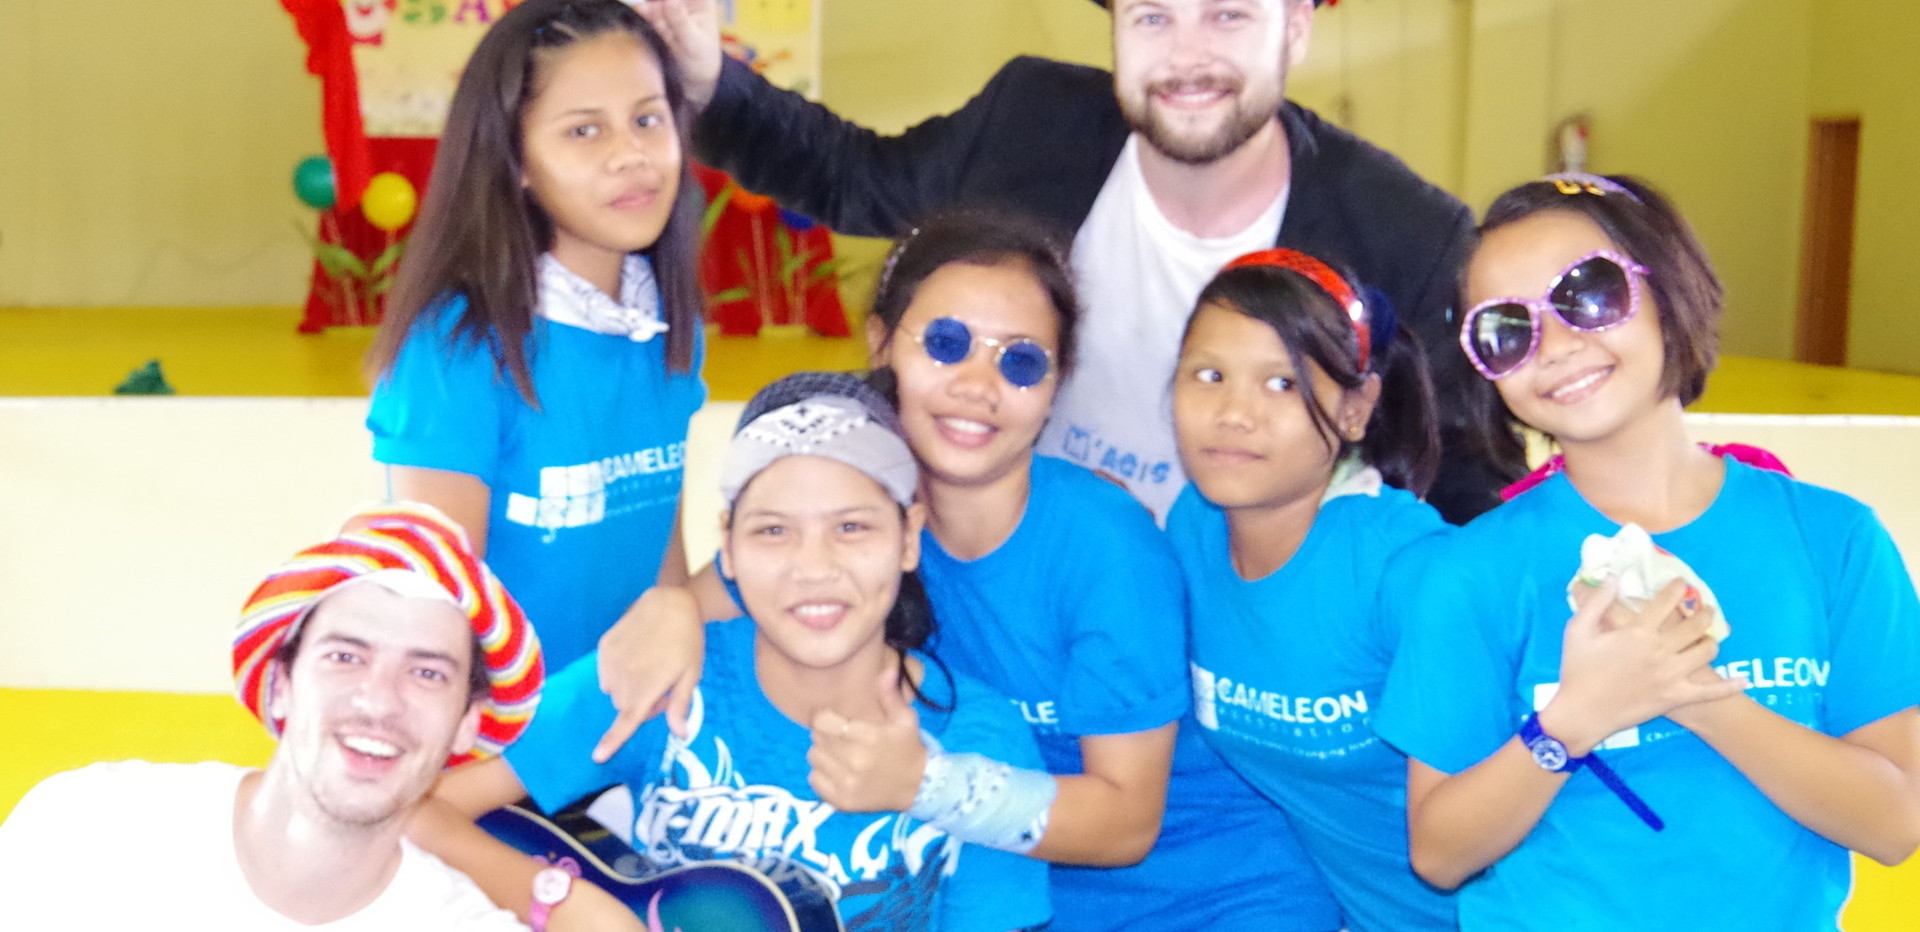 Philippines2014_06.jpg